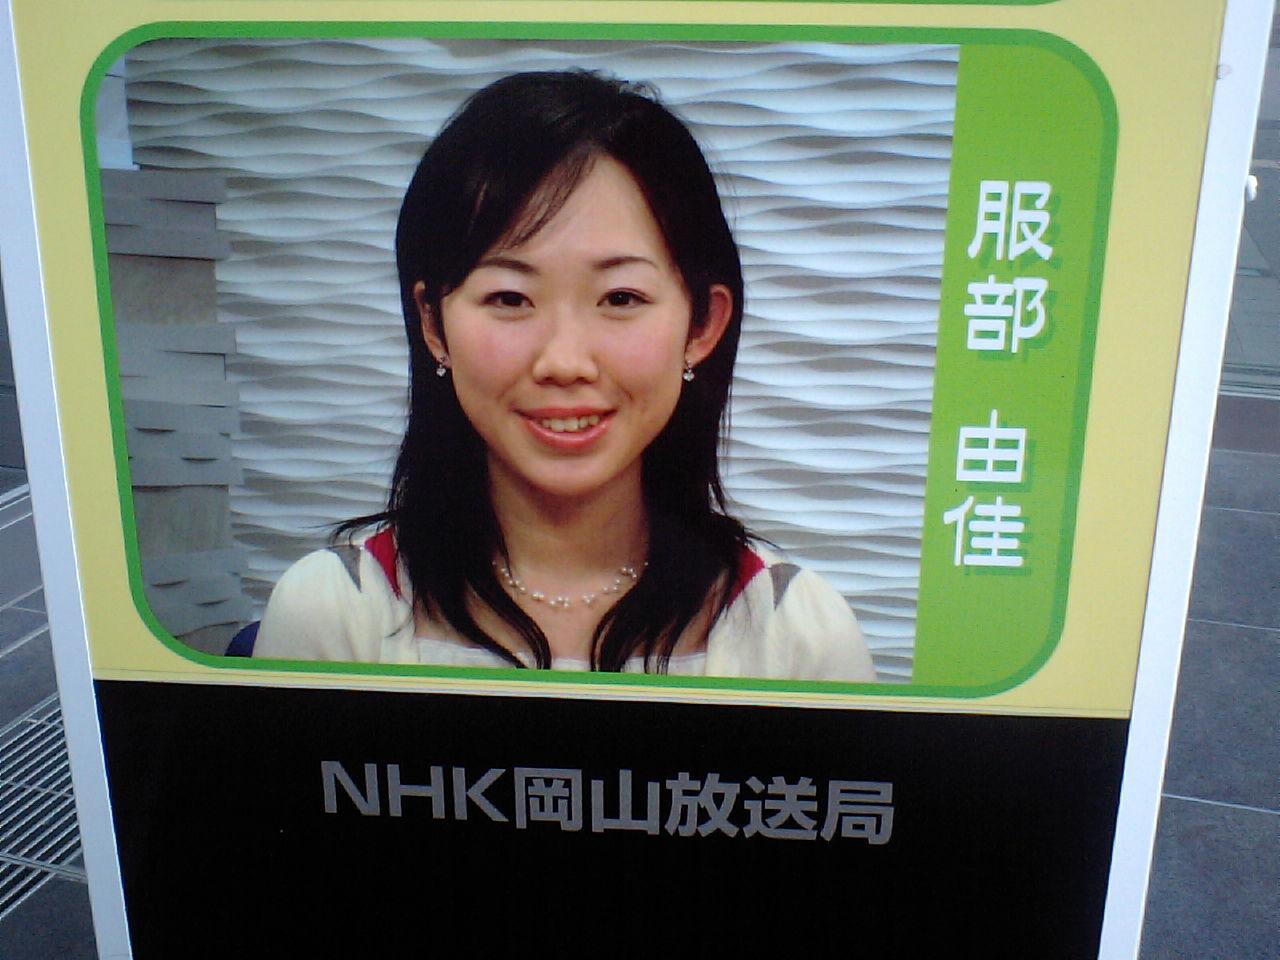 ca380529 色白で純日本風の福笑いのようなお顔に、きめ細やかな肌つやでやばいほどツボだ。